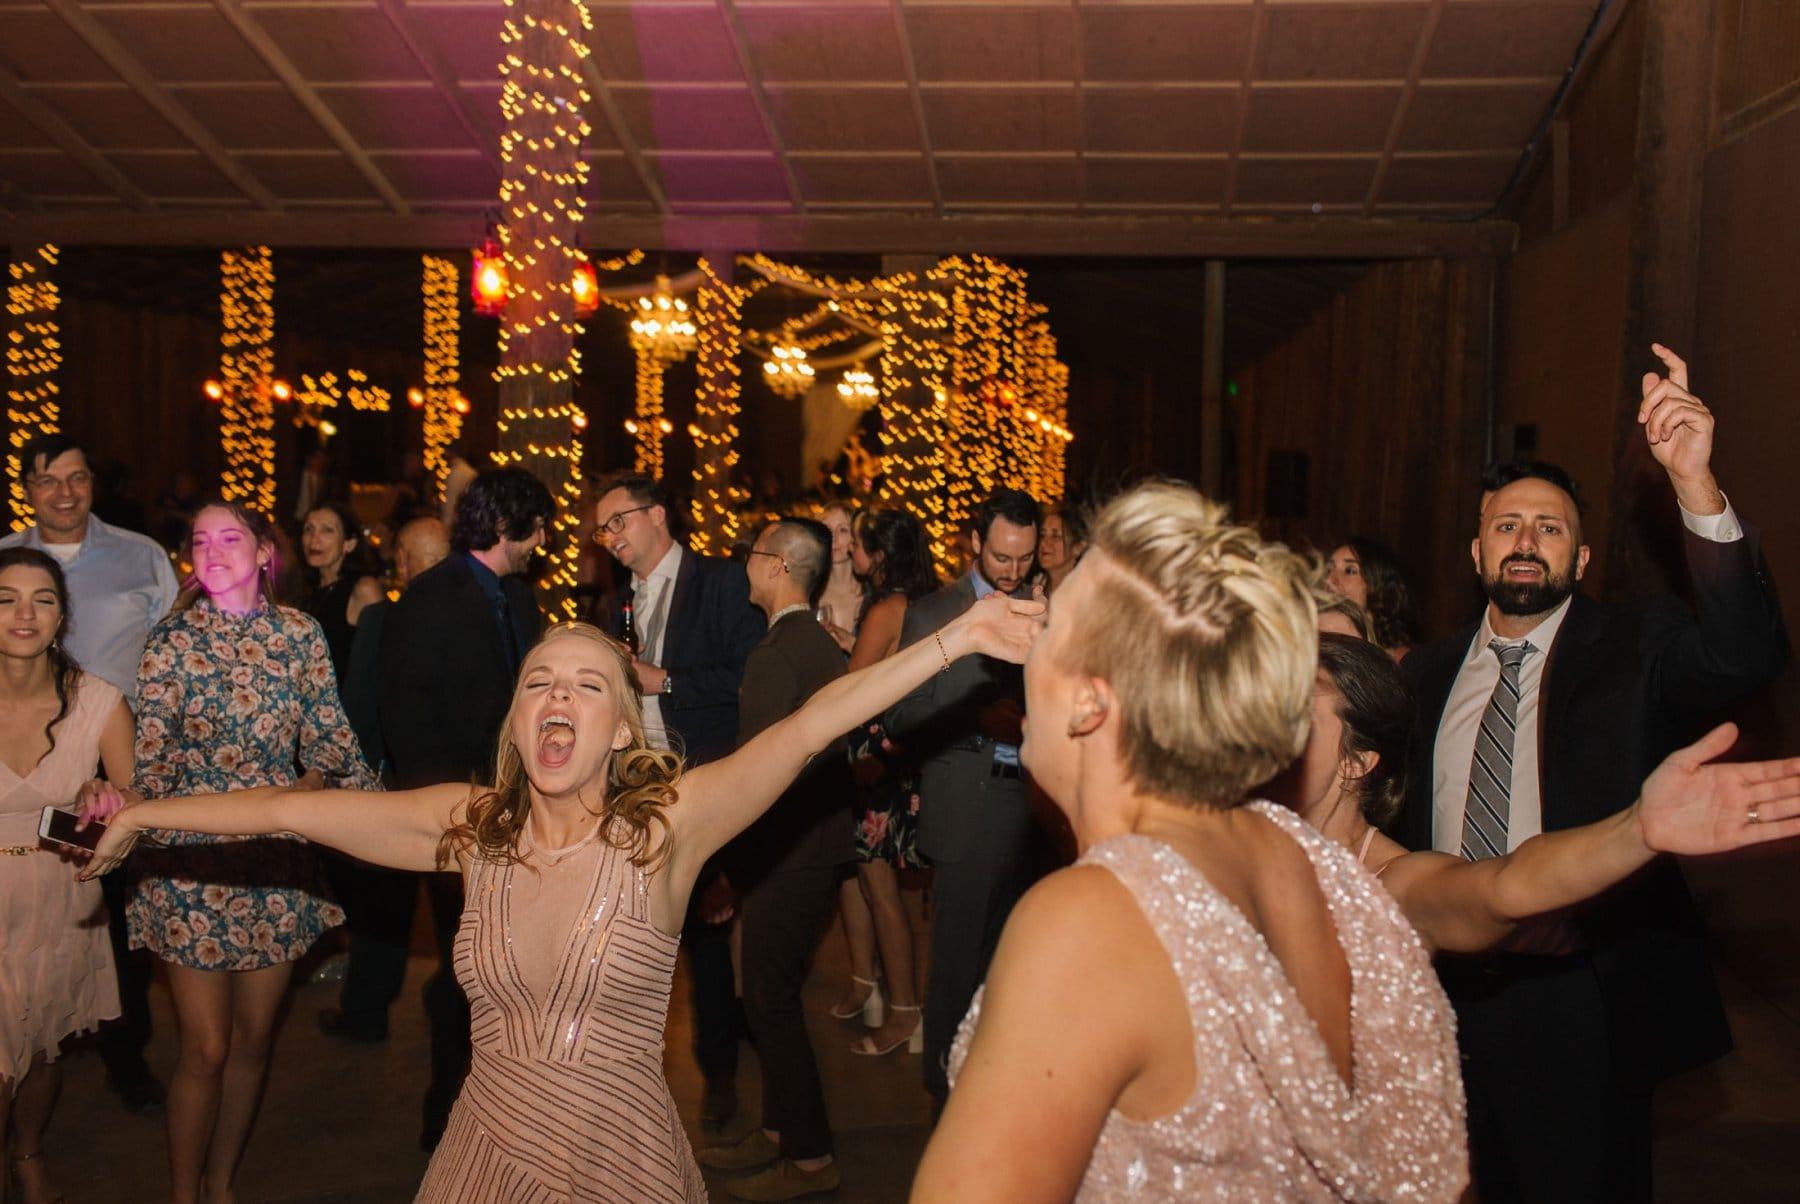 elegant rustic barn wedding Desert Foothills reception dancing